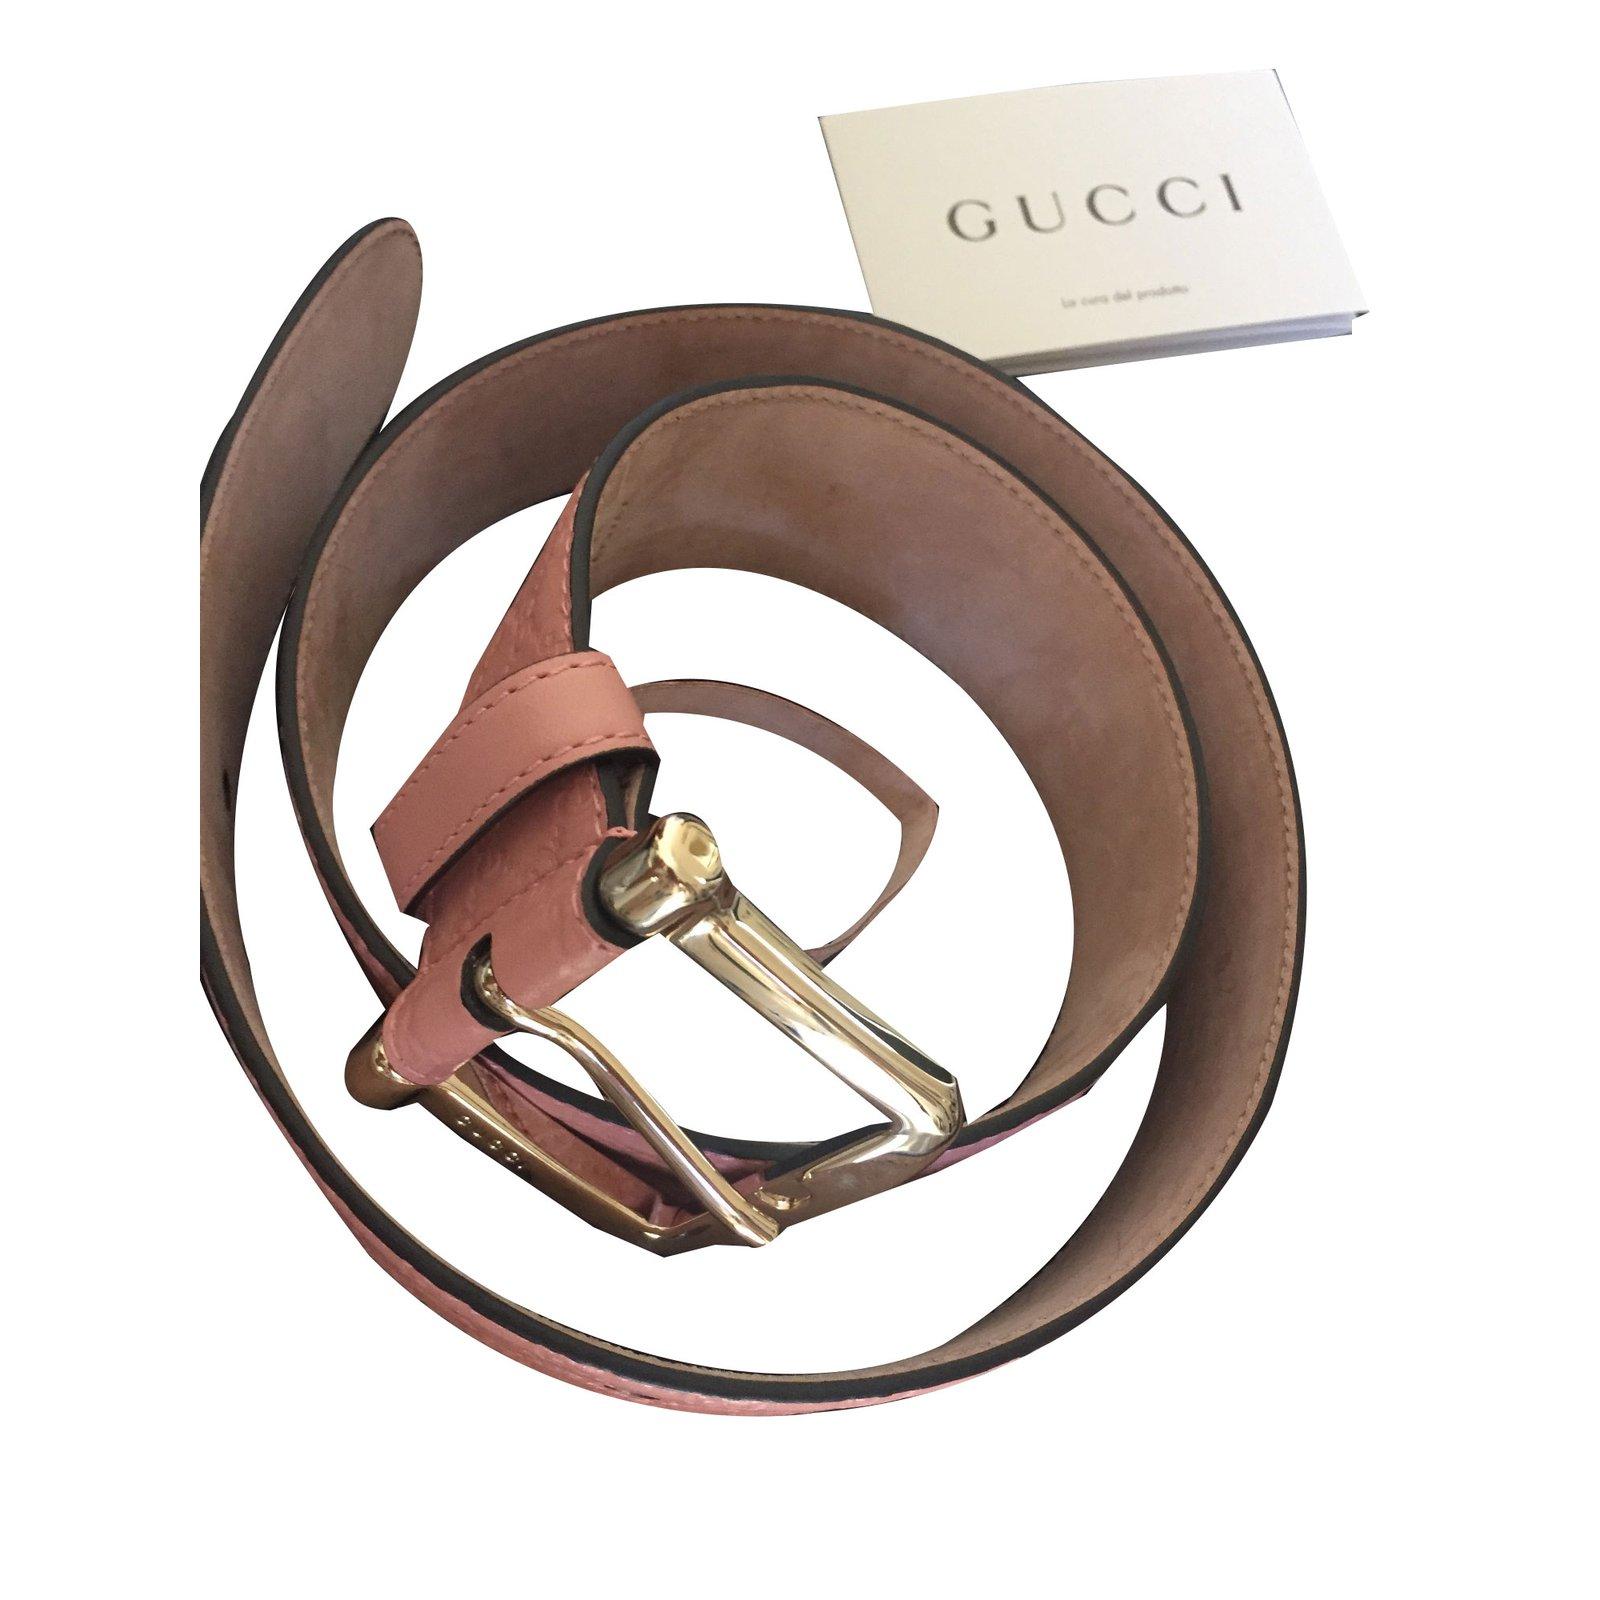 Ceintures Gucci monogram cuir ceinture Cuir Rose ref.79001 - Joli Closet 7e8b260019e